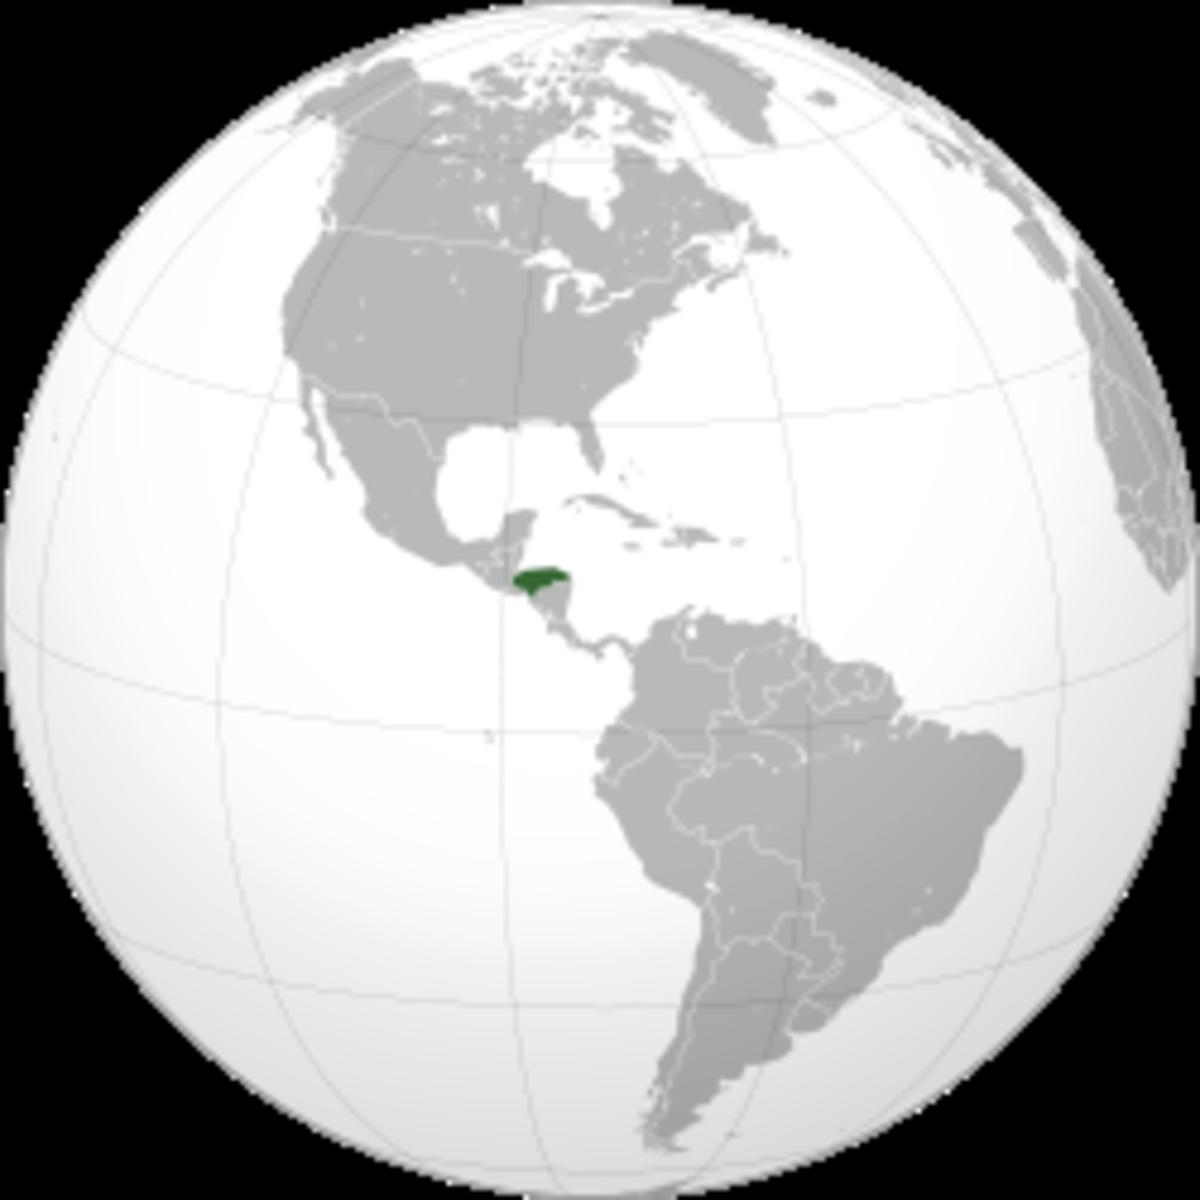 Map showing Honduras